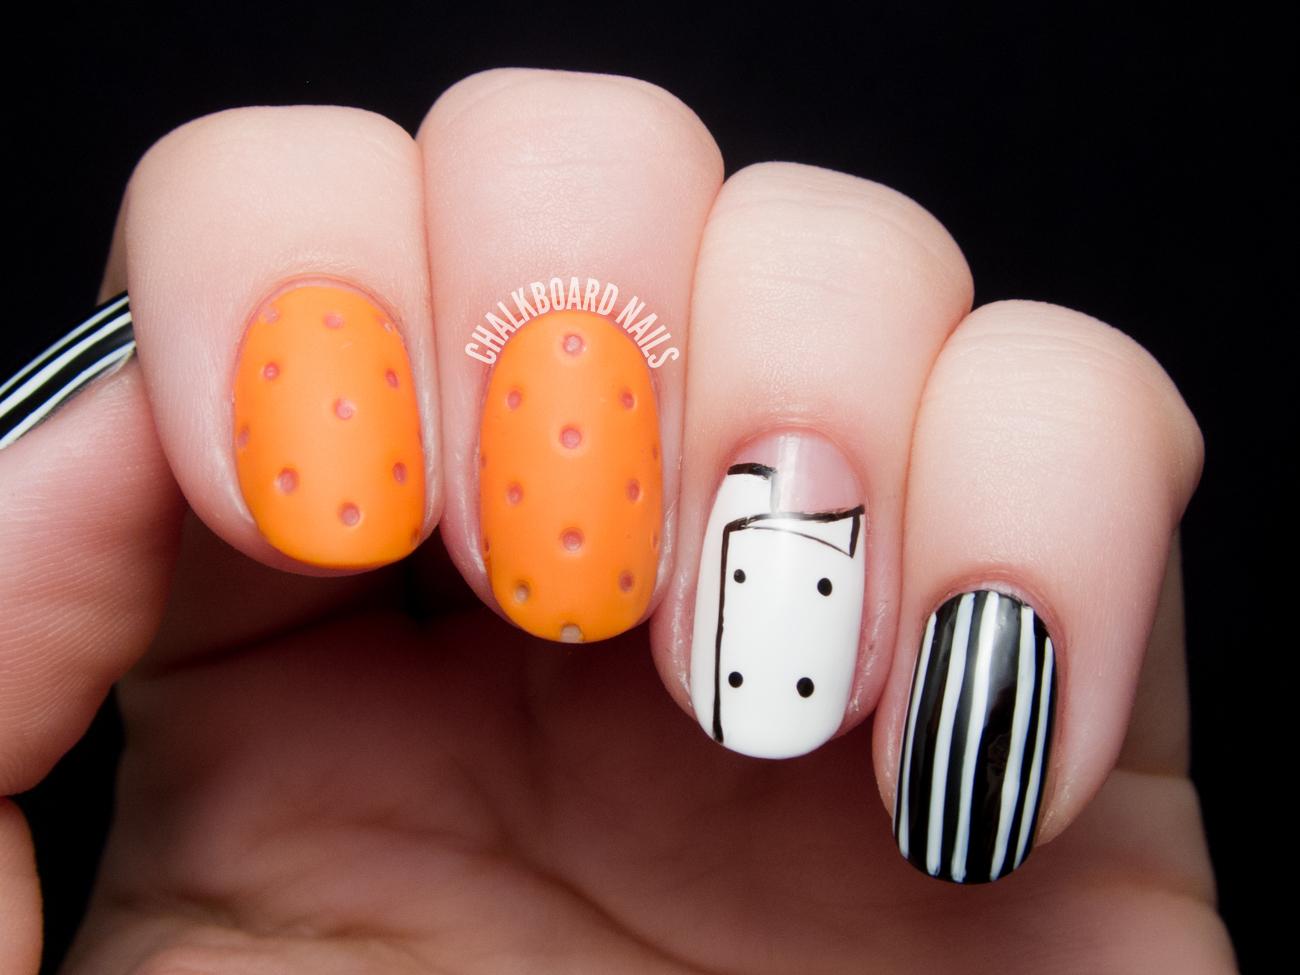 Mario batalis orange crocs nail art chalkboard nails nail art mario batalis orange crocs nail art prinsesfo Choice Image